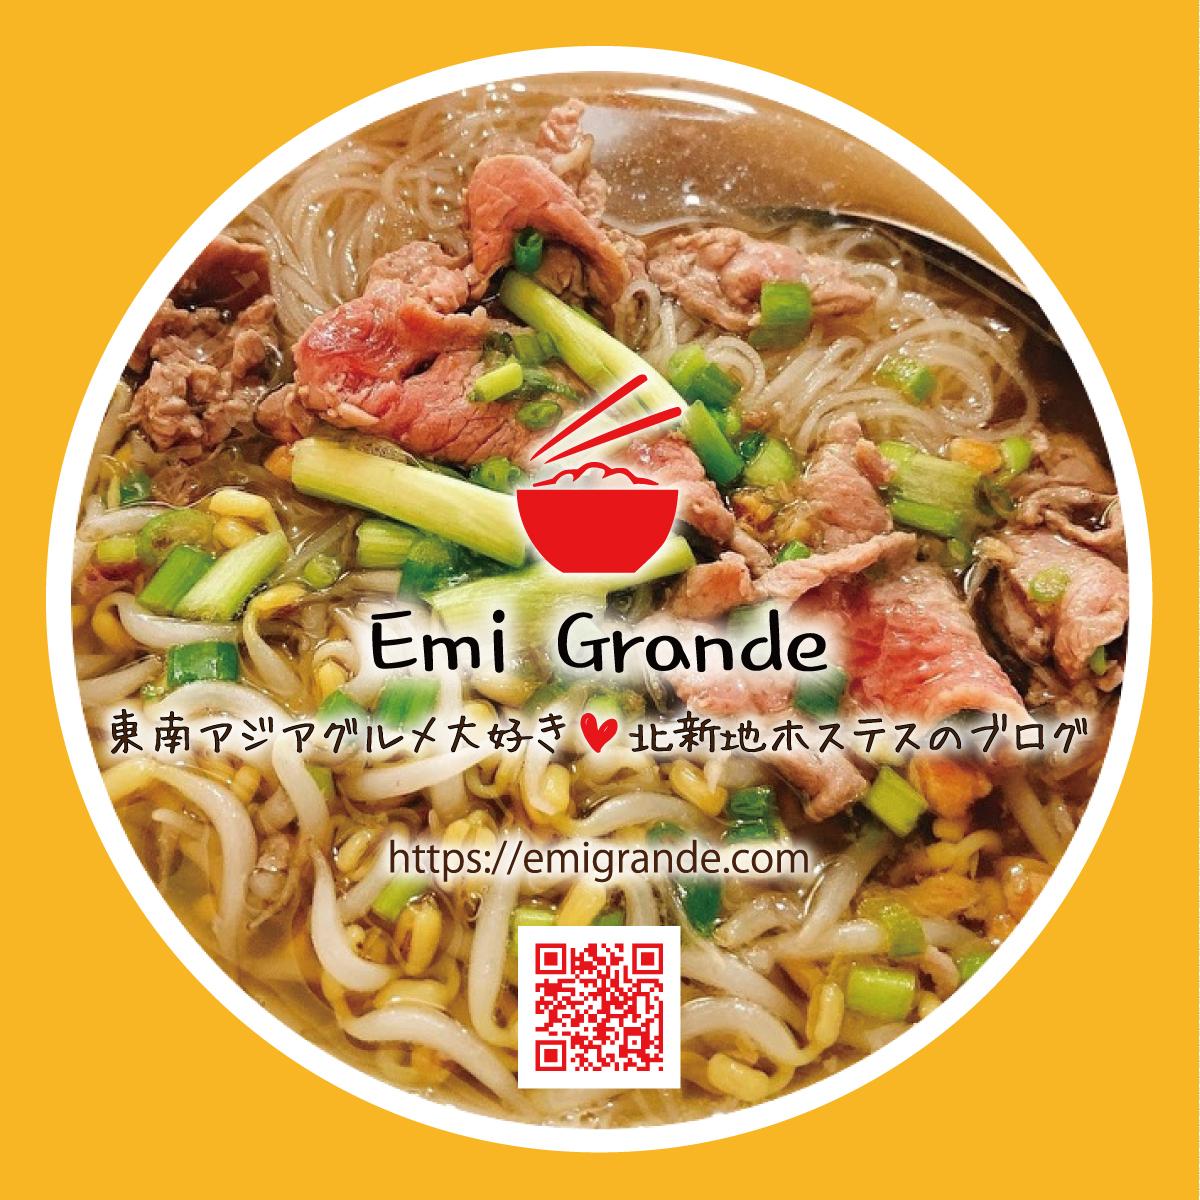 Emi Grande 様 オリジナルステッカーサンプルデザイン2